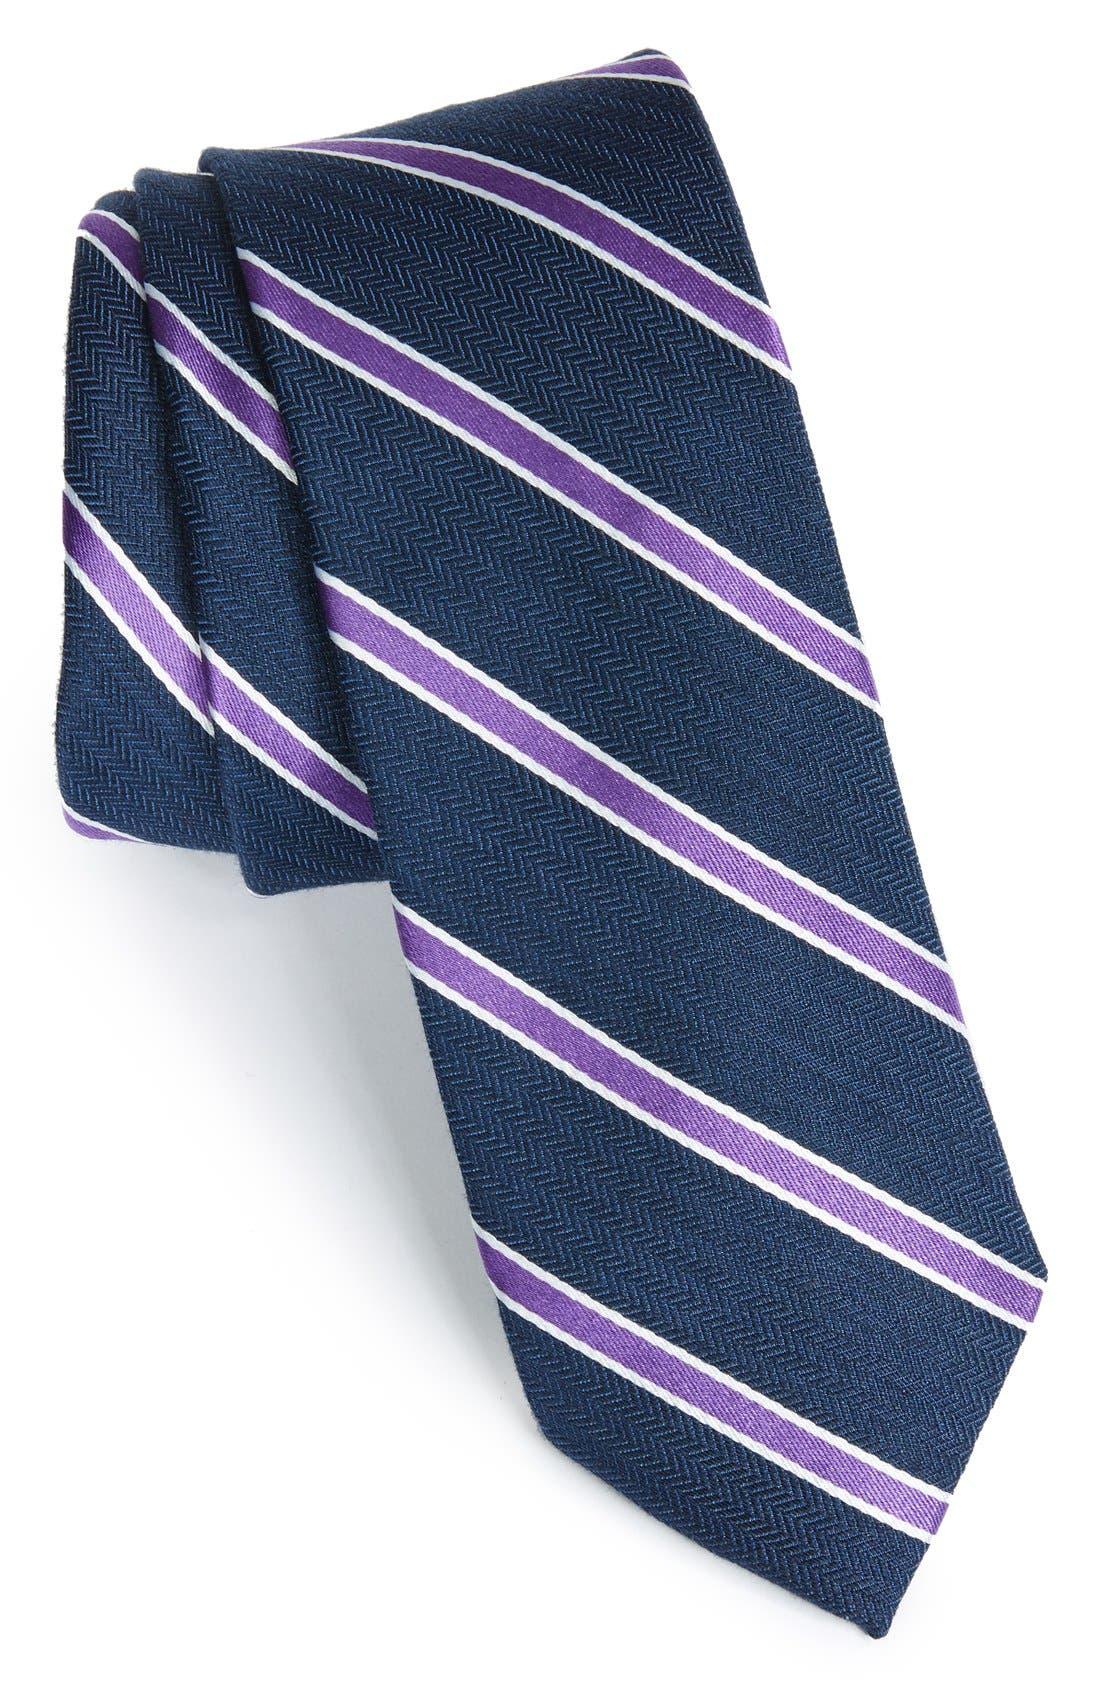 Alternate Image 1 Selected - 1901 'Smoak' Stripe Woven Silk & Cotton Tie